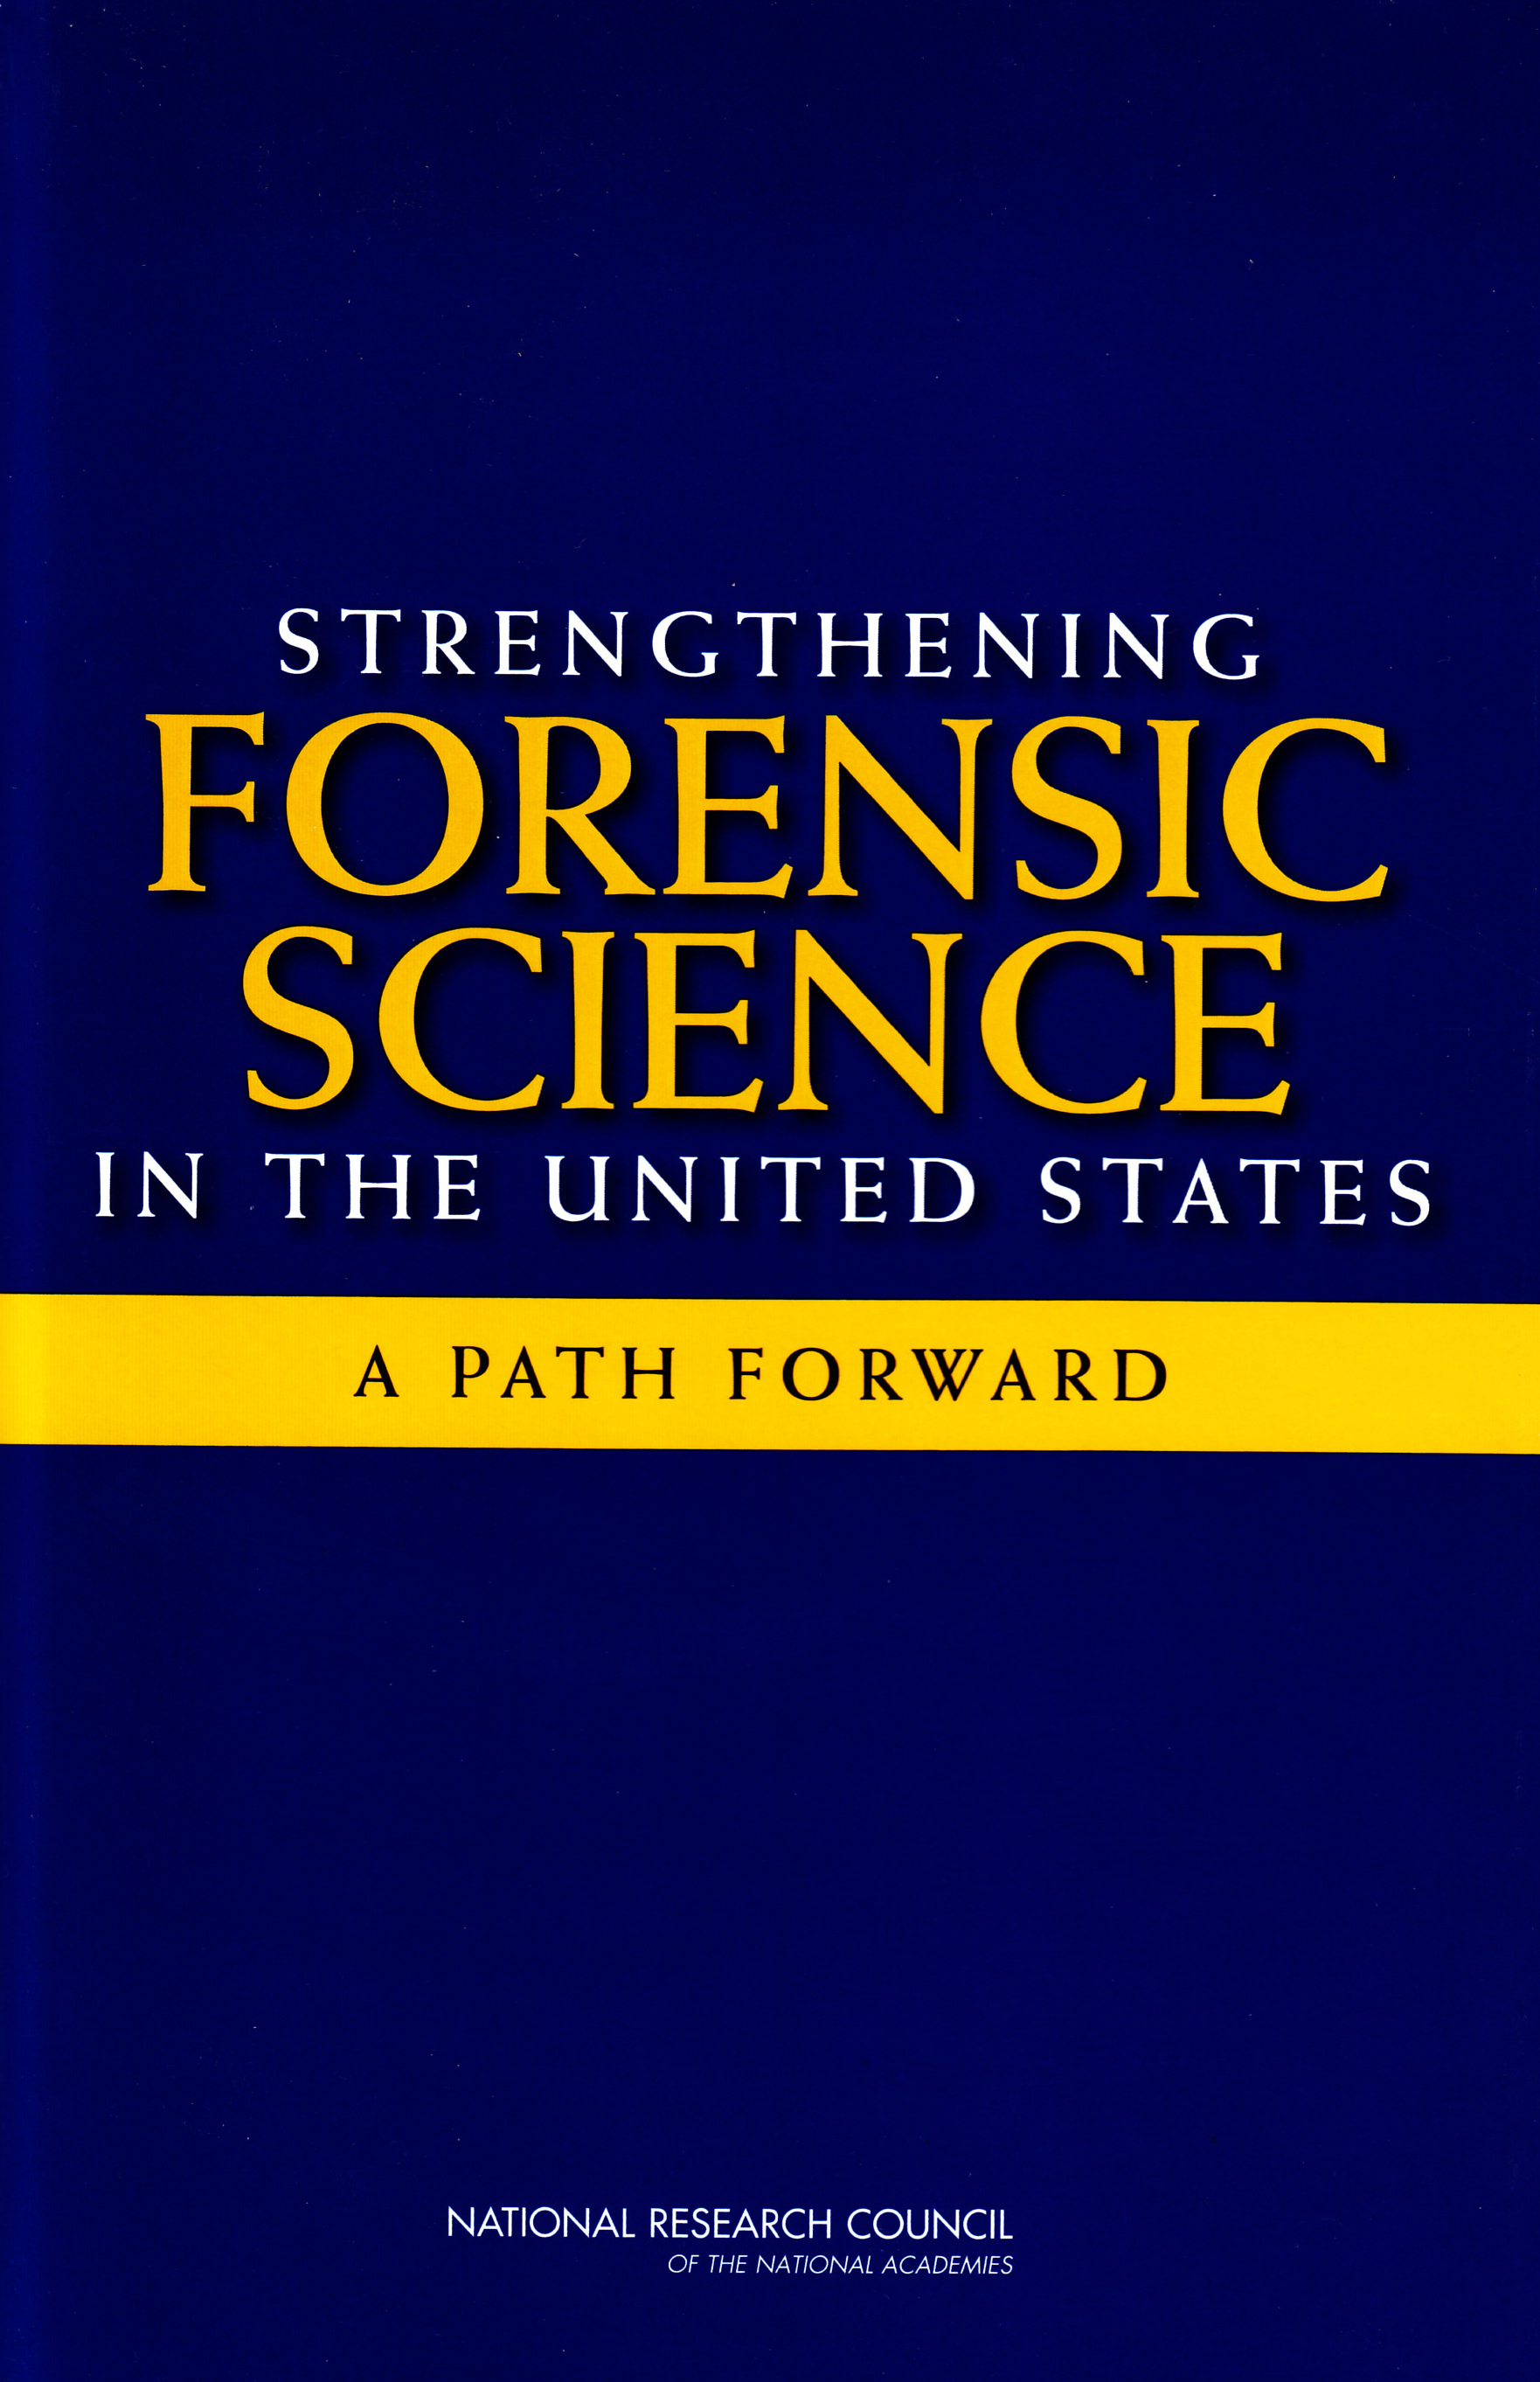 Image result for junk forensic science